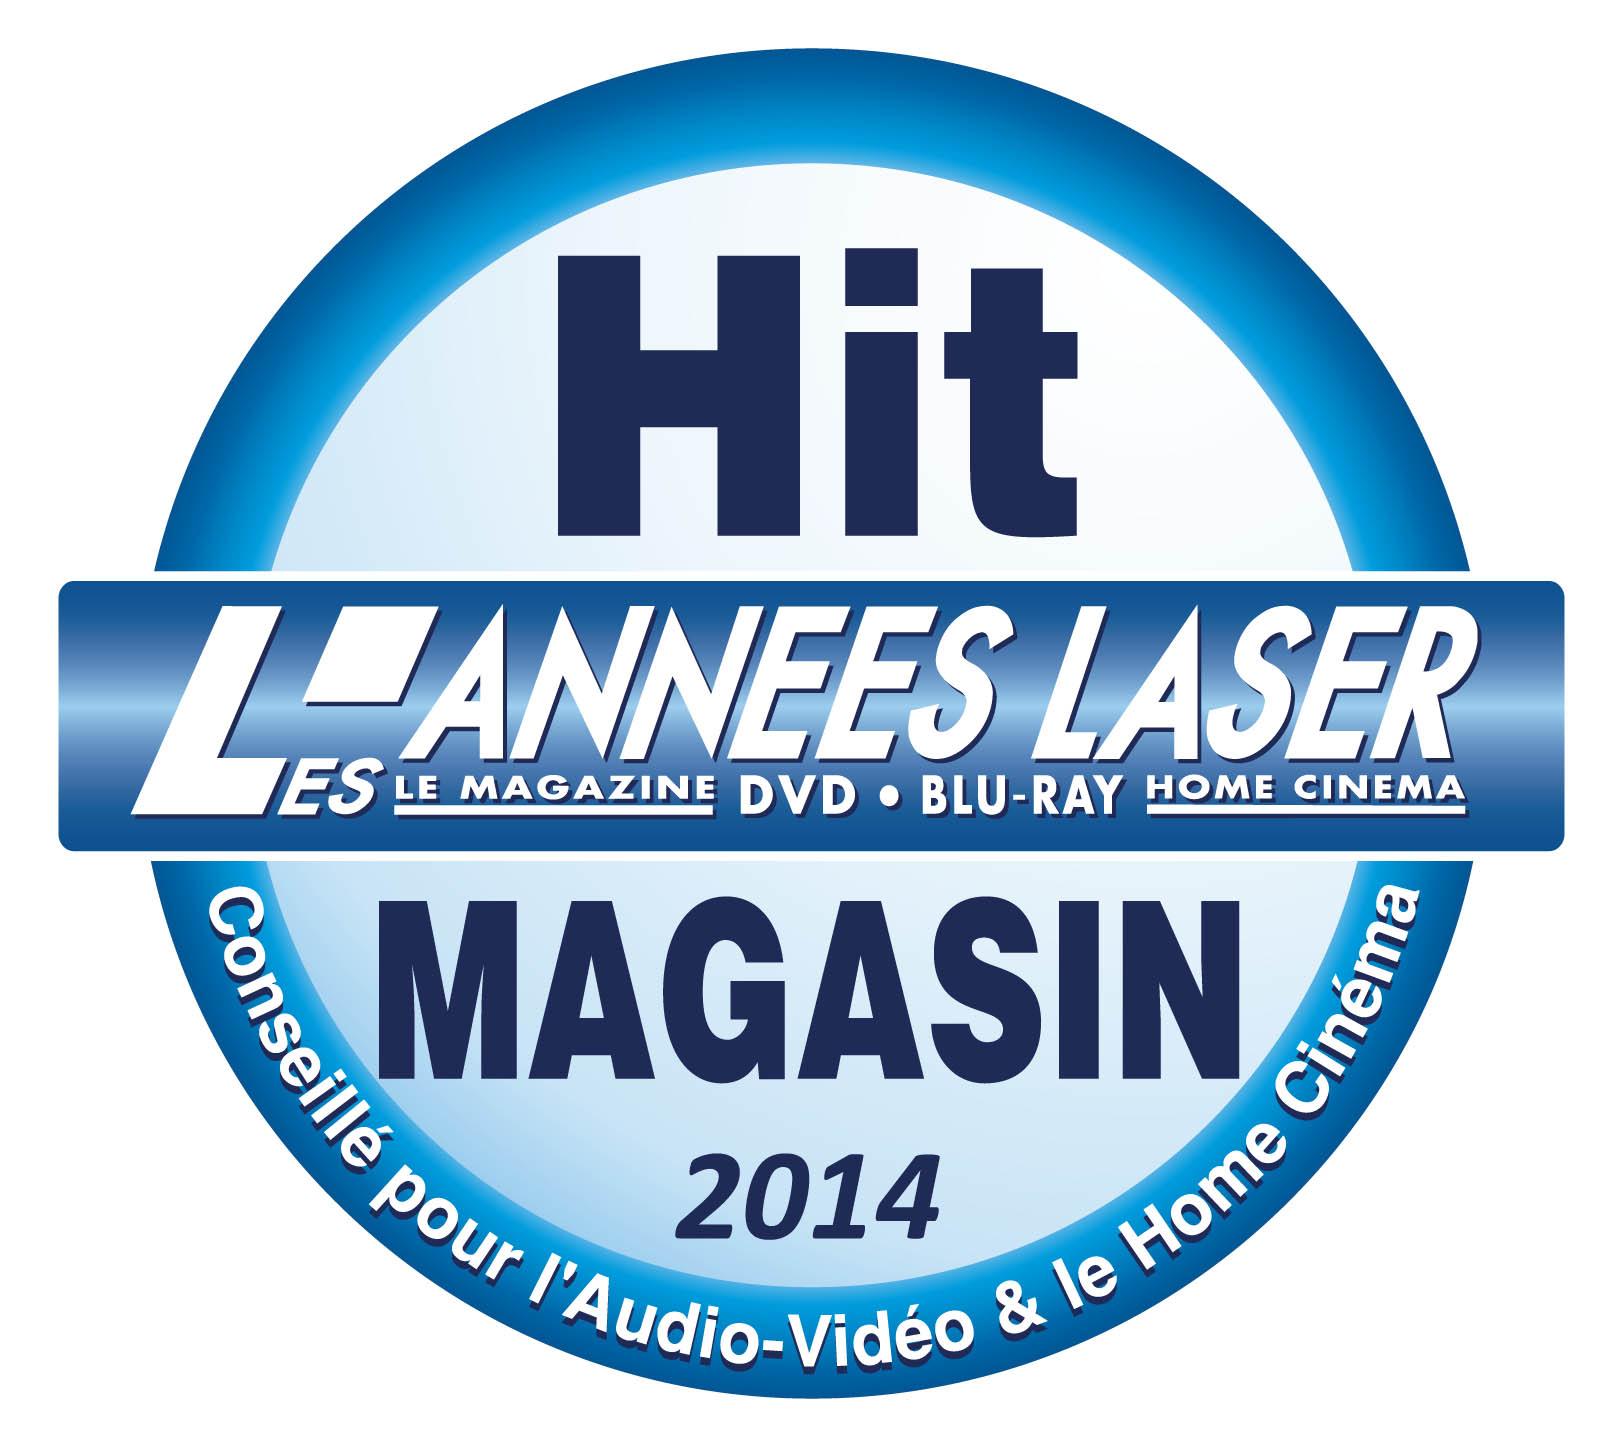 hit-magasin-les-annees-laser-2014